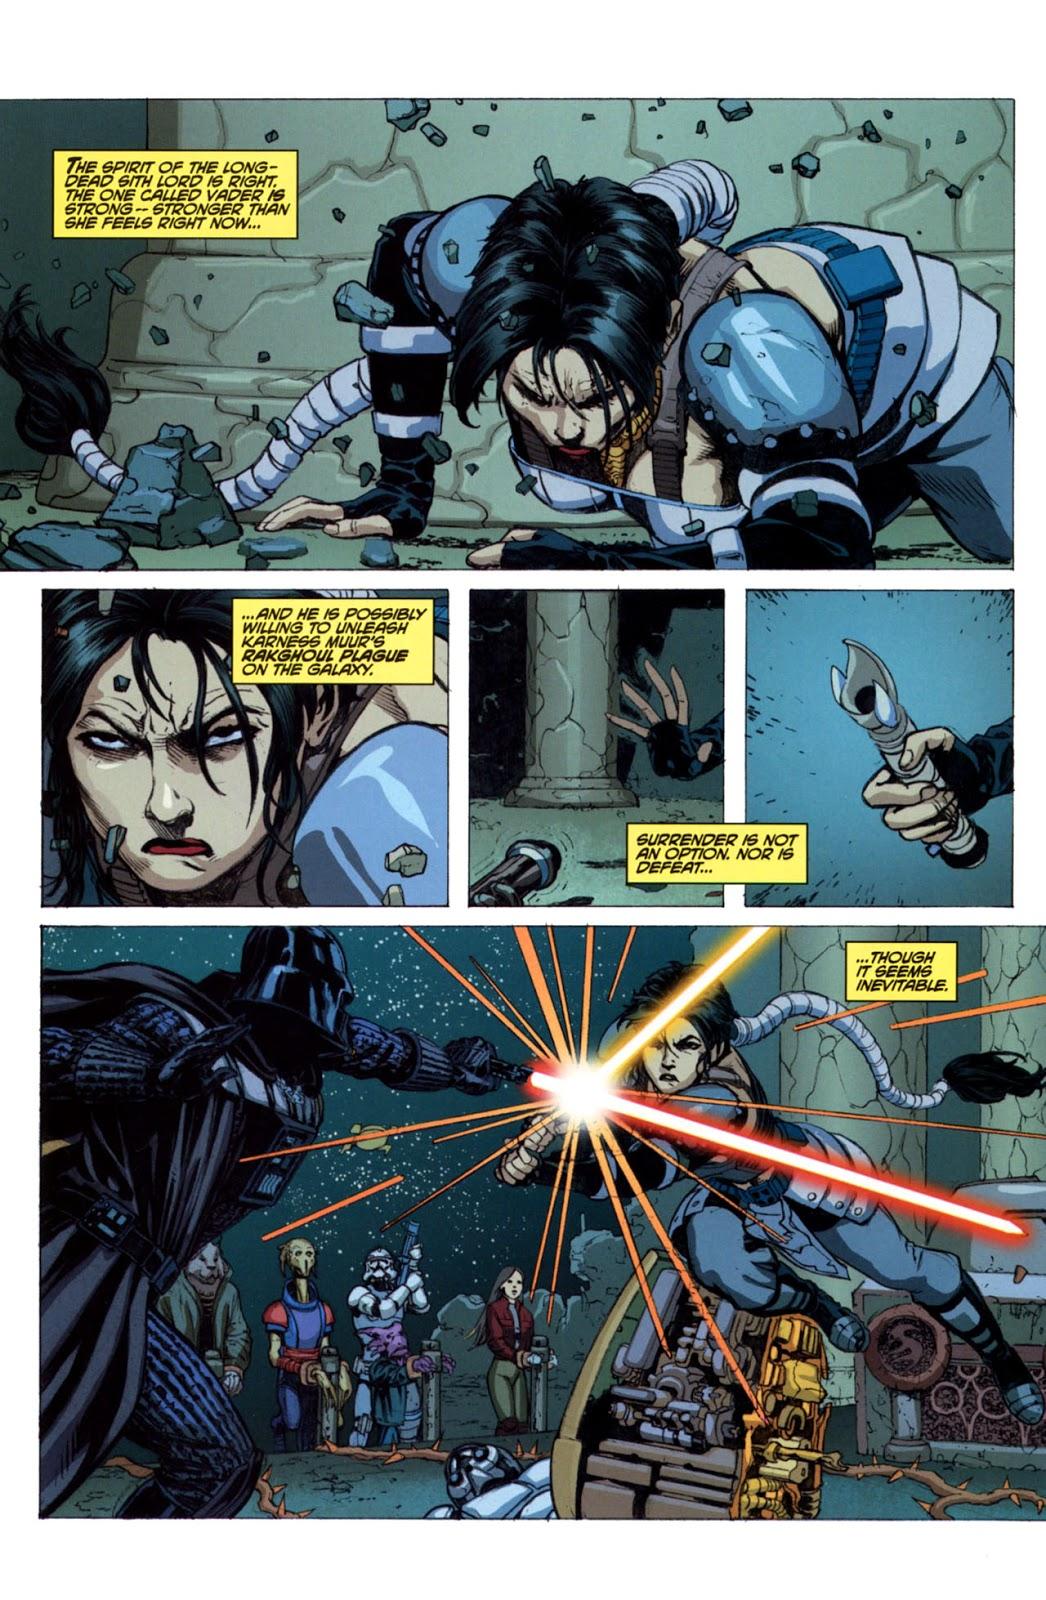 Darth Vader vs A'Sharad Hett - Page 3 JQqdFzvRrcCNOH3eAiDuY0z79qksIbIXWKmaAzmUa4ykAmULrTMQ_rMGENtI6OlnRjwPBB1O-JGRLijiW_Cm7uf-MVula7M0YLwUiKTPGje69AbmRdaGEYP6q39CWeyWw0k5WTtd